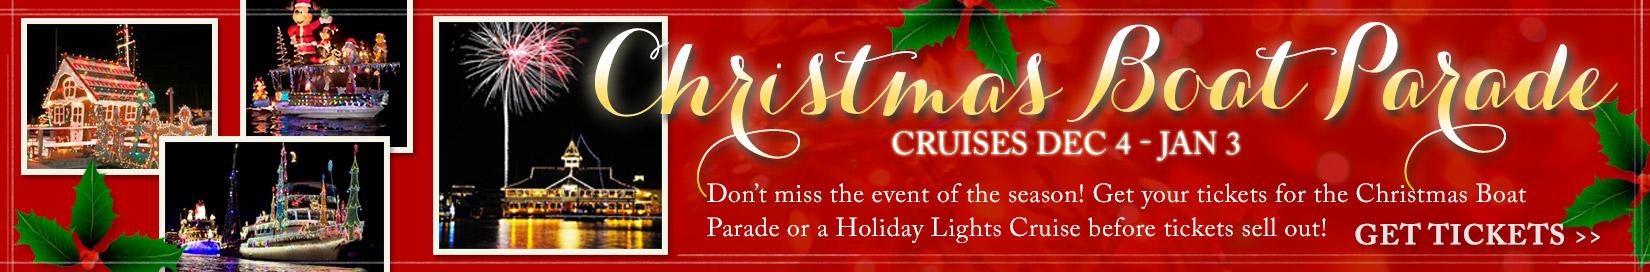 Cruise Newport Beach Holiday Cruises